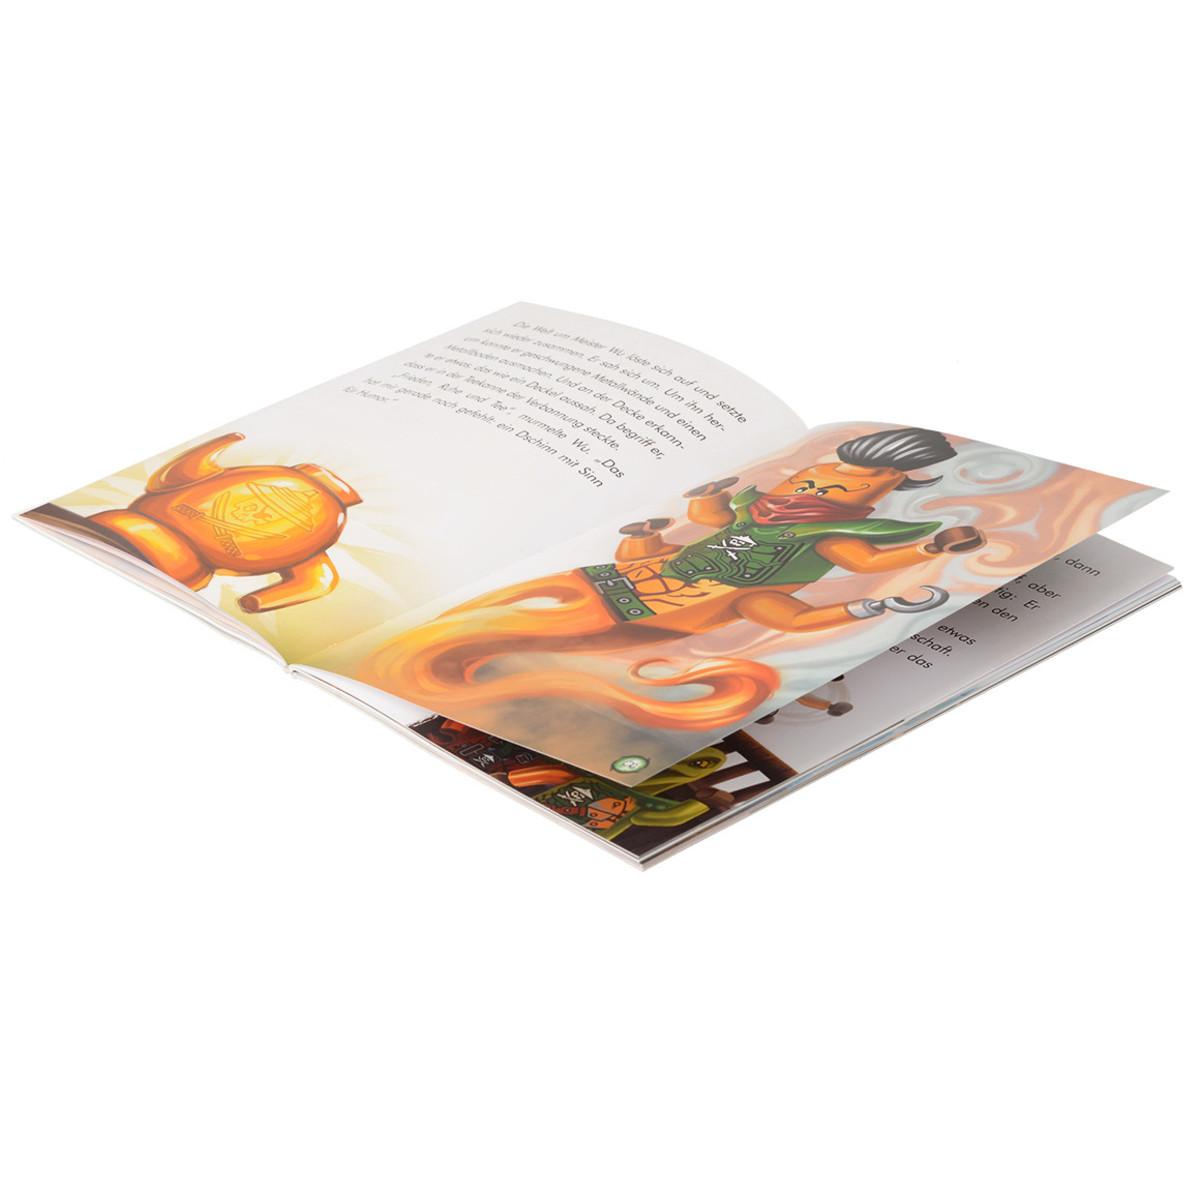 "Bild 3 von LEGO Ninjago Buch ""Ninja gegen Luftpiraten"""